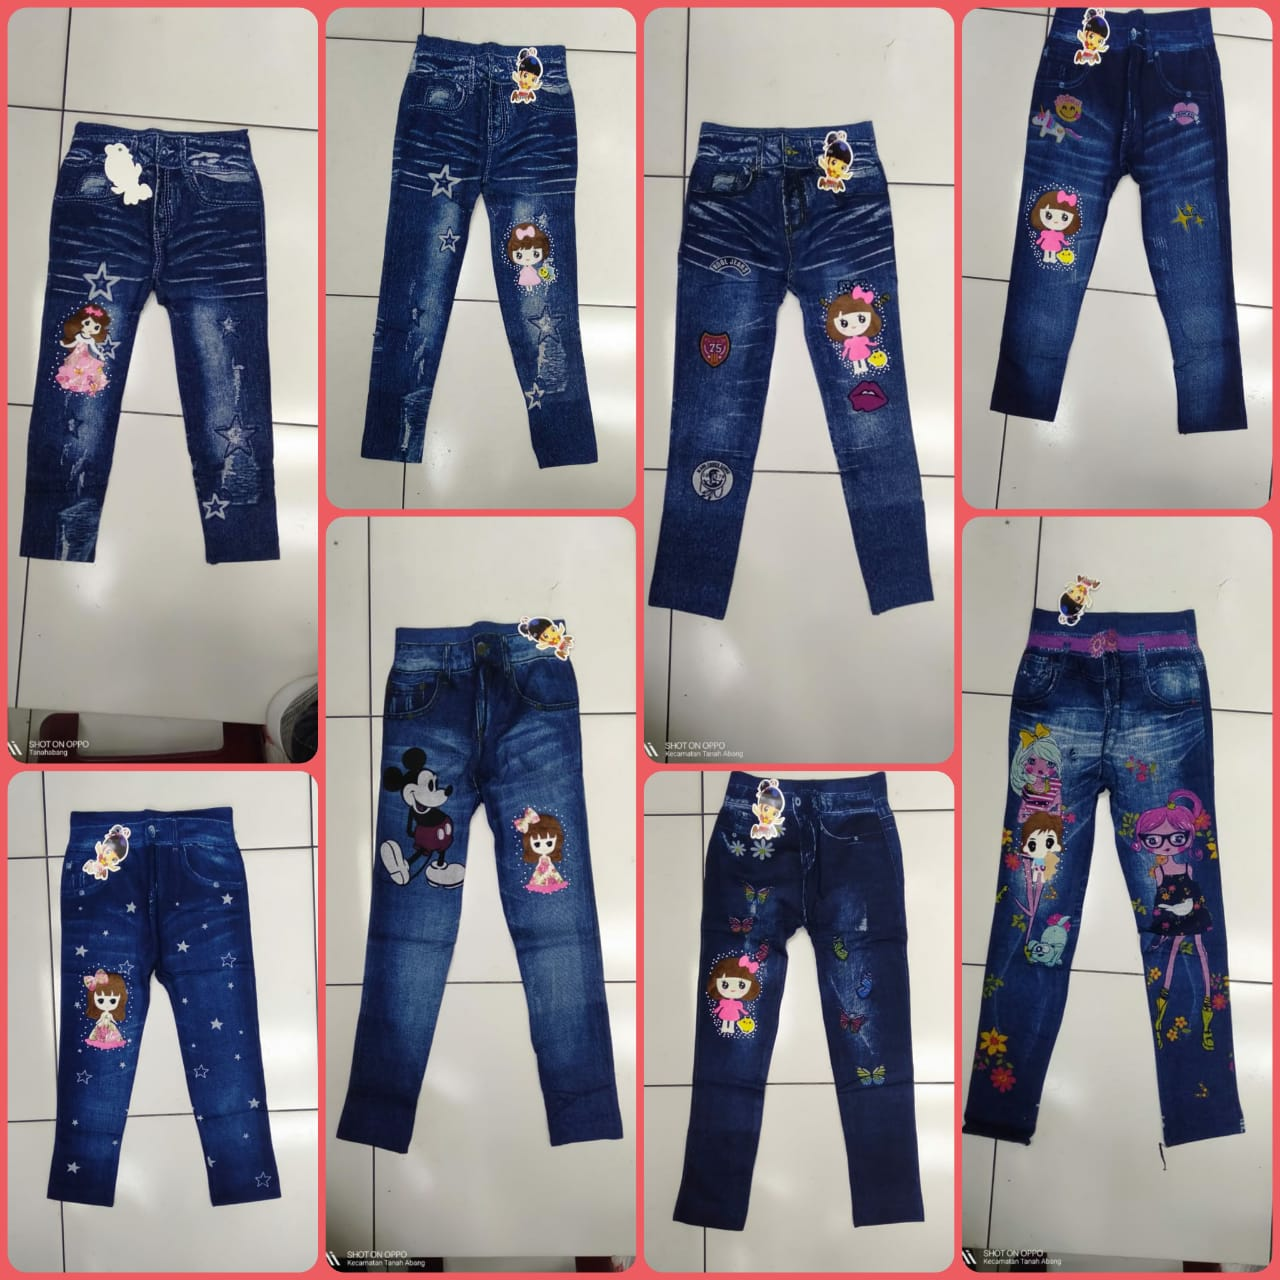 M2 Store Celana Legging Shoft Jeans Import 4 12t Celana Anak Legging Anak Bawahan Celana Celana Lazada Indonesia